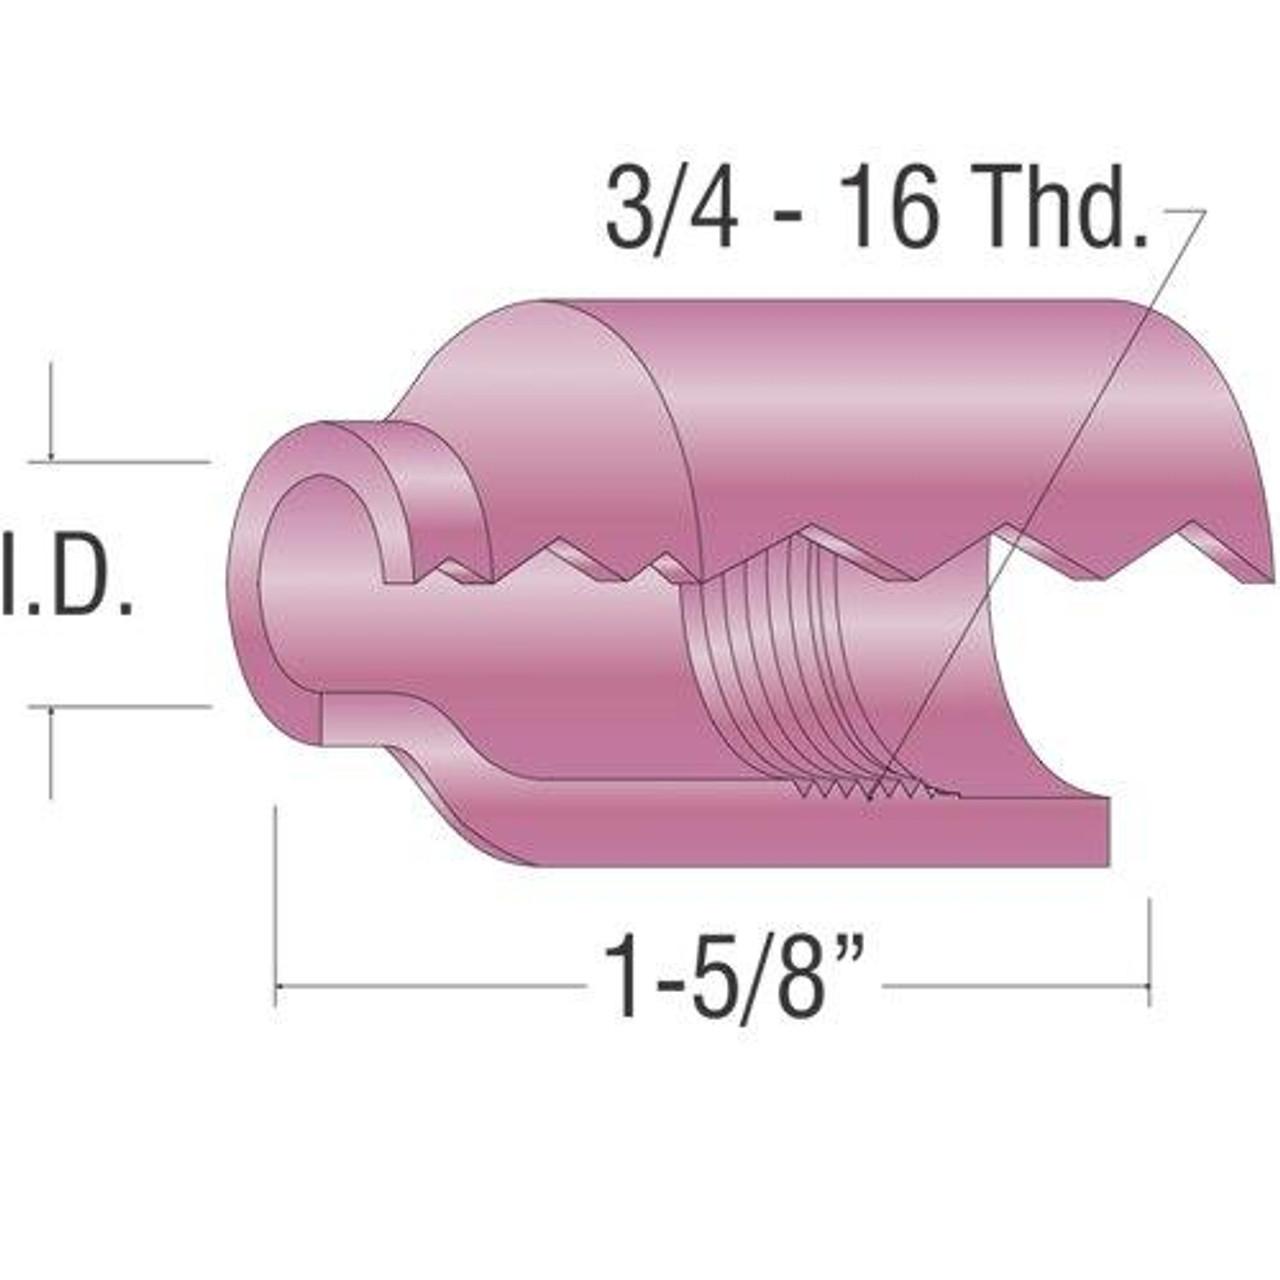 Profax 54N17 Alumina Cup 5/16 17-18-26 Series TIG Torch - 10 Pack